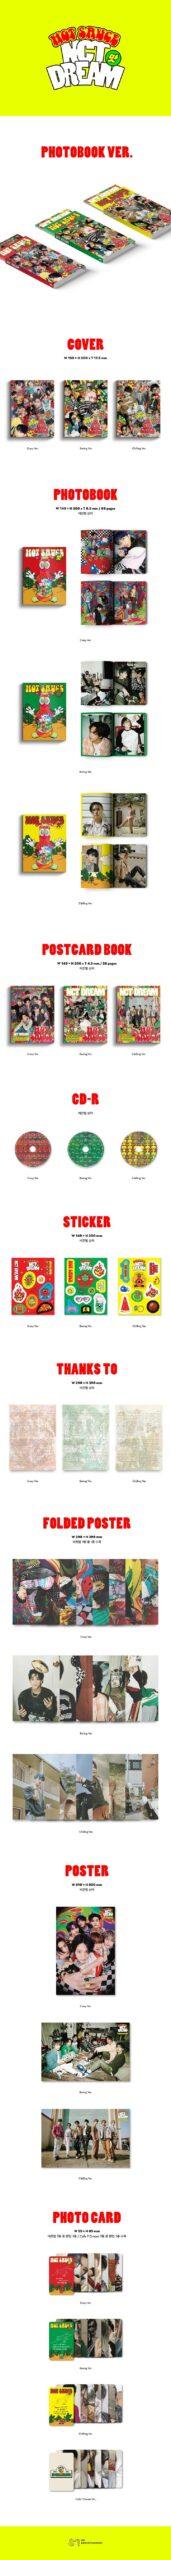 NCT DREAM Vol.1 Hot Sauce PHOTOBOOK Random Ver. Poster 2